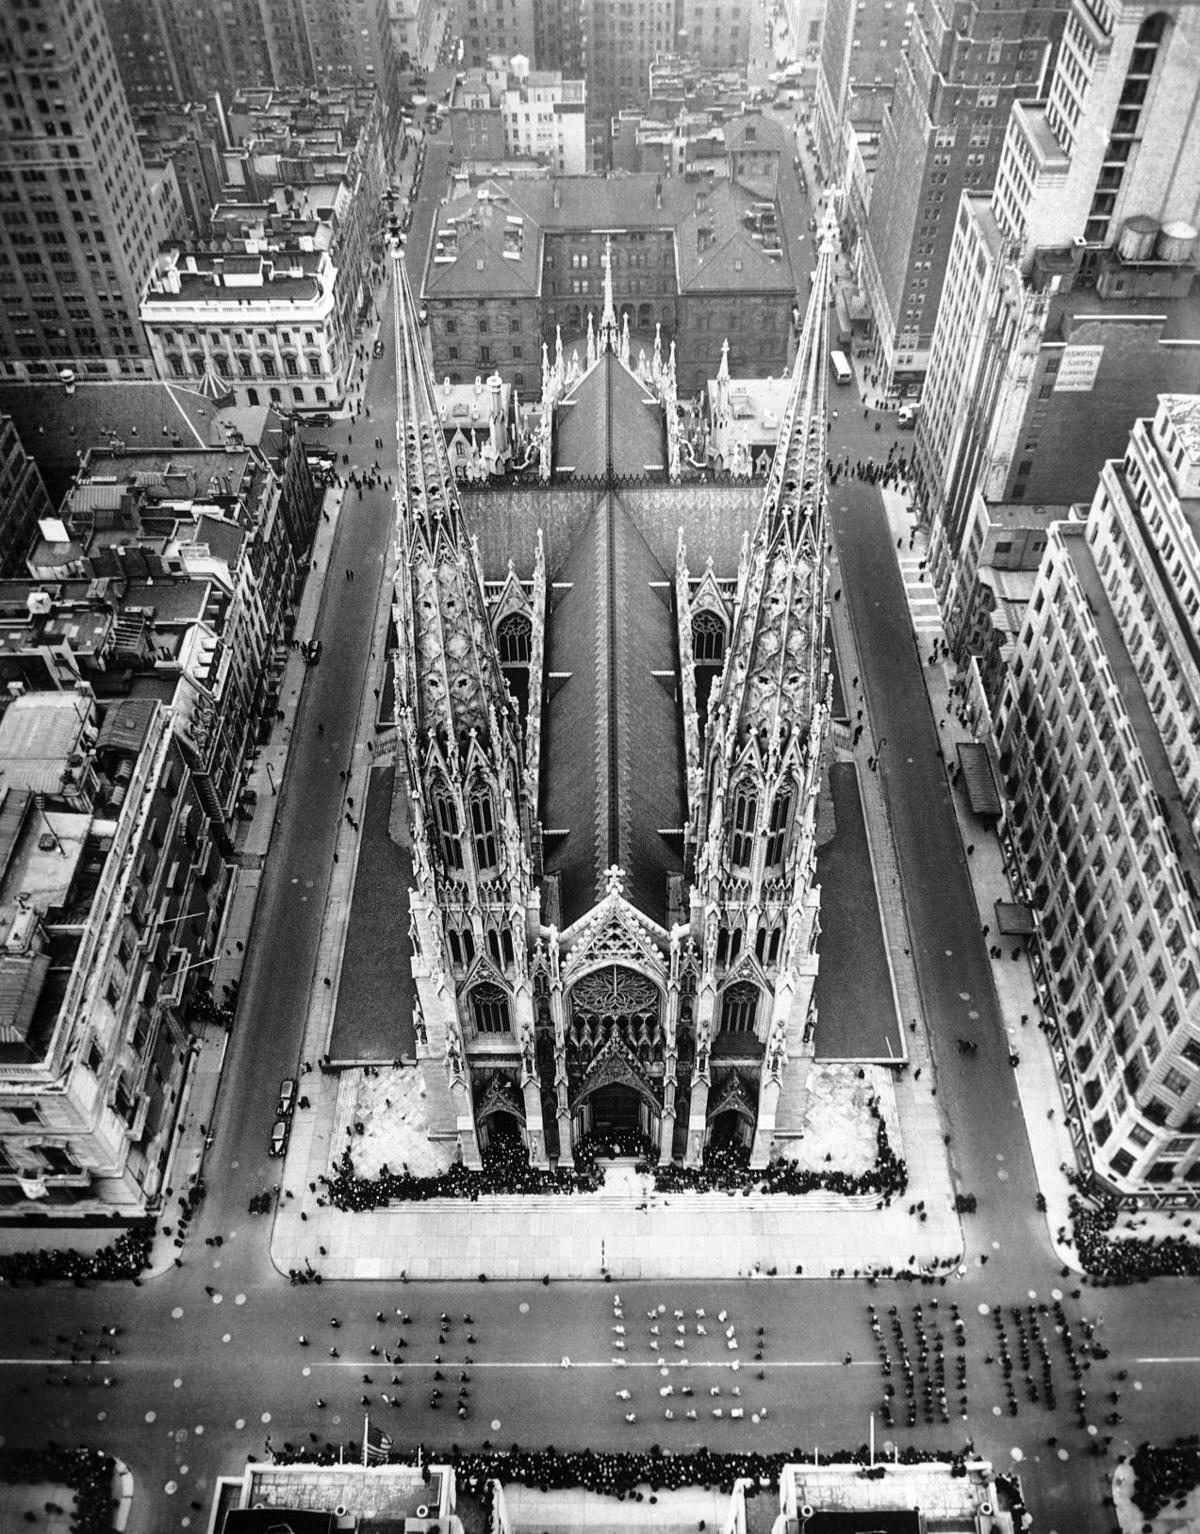 1938 St. Patrick's Day Parade